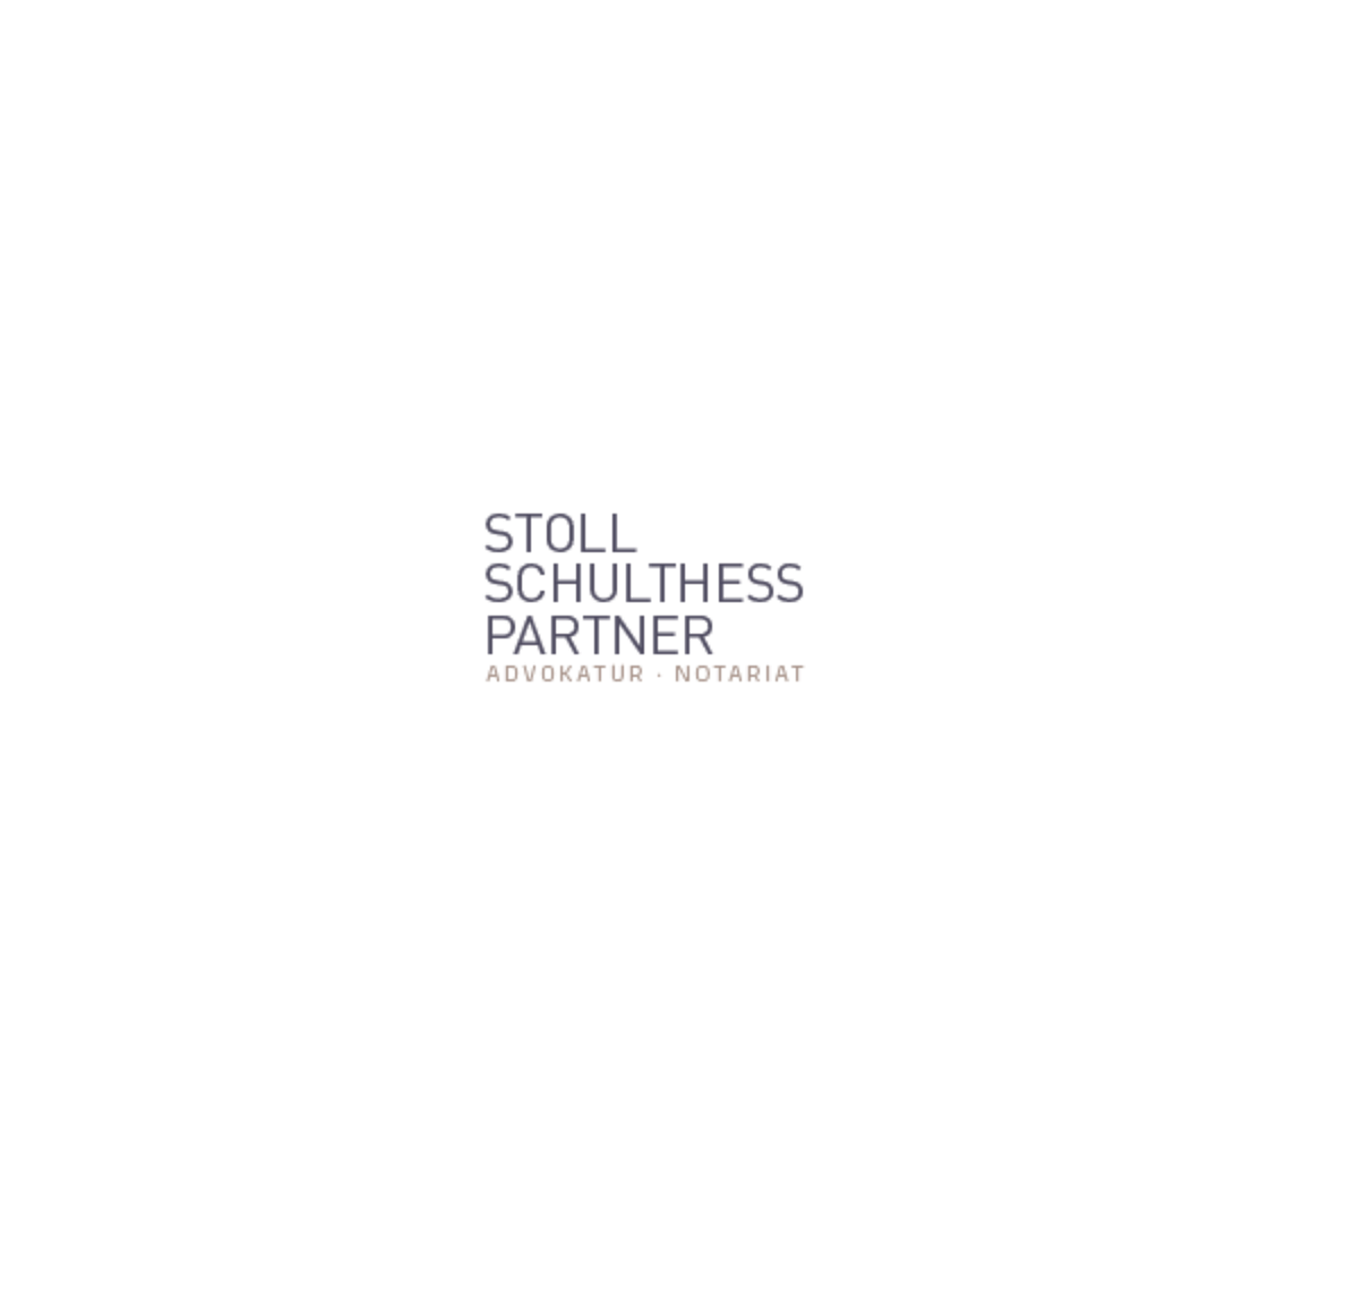 Advokatur & Notariat Stoll Schulthess Partner